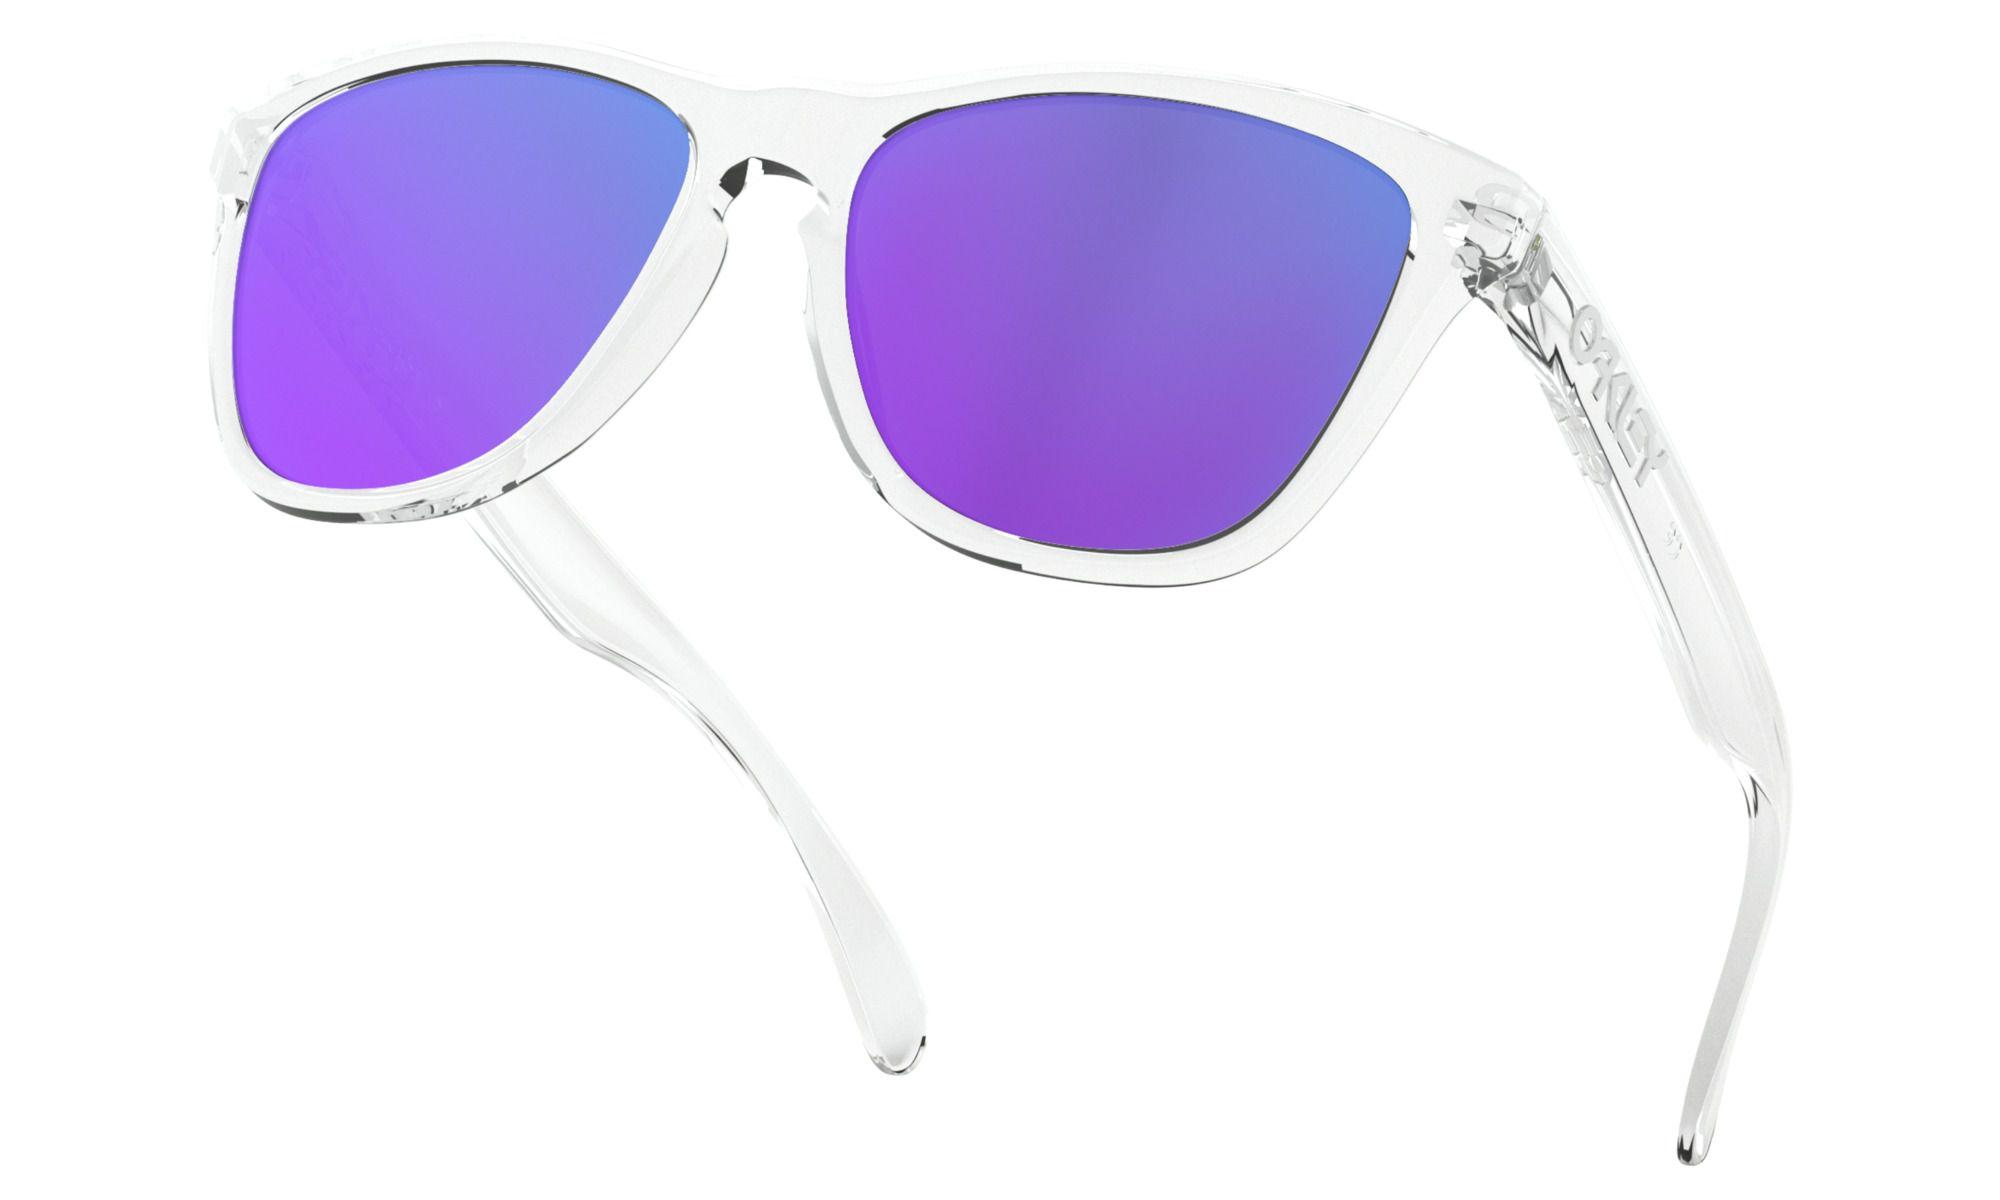 Óculos Oakley Frogskins Transparente Prizm Violet